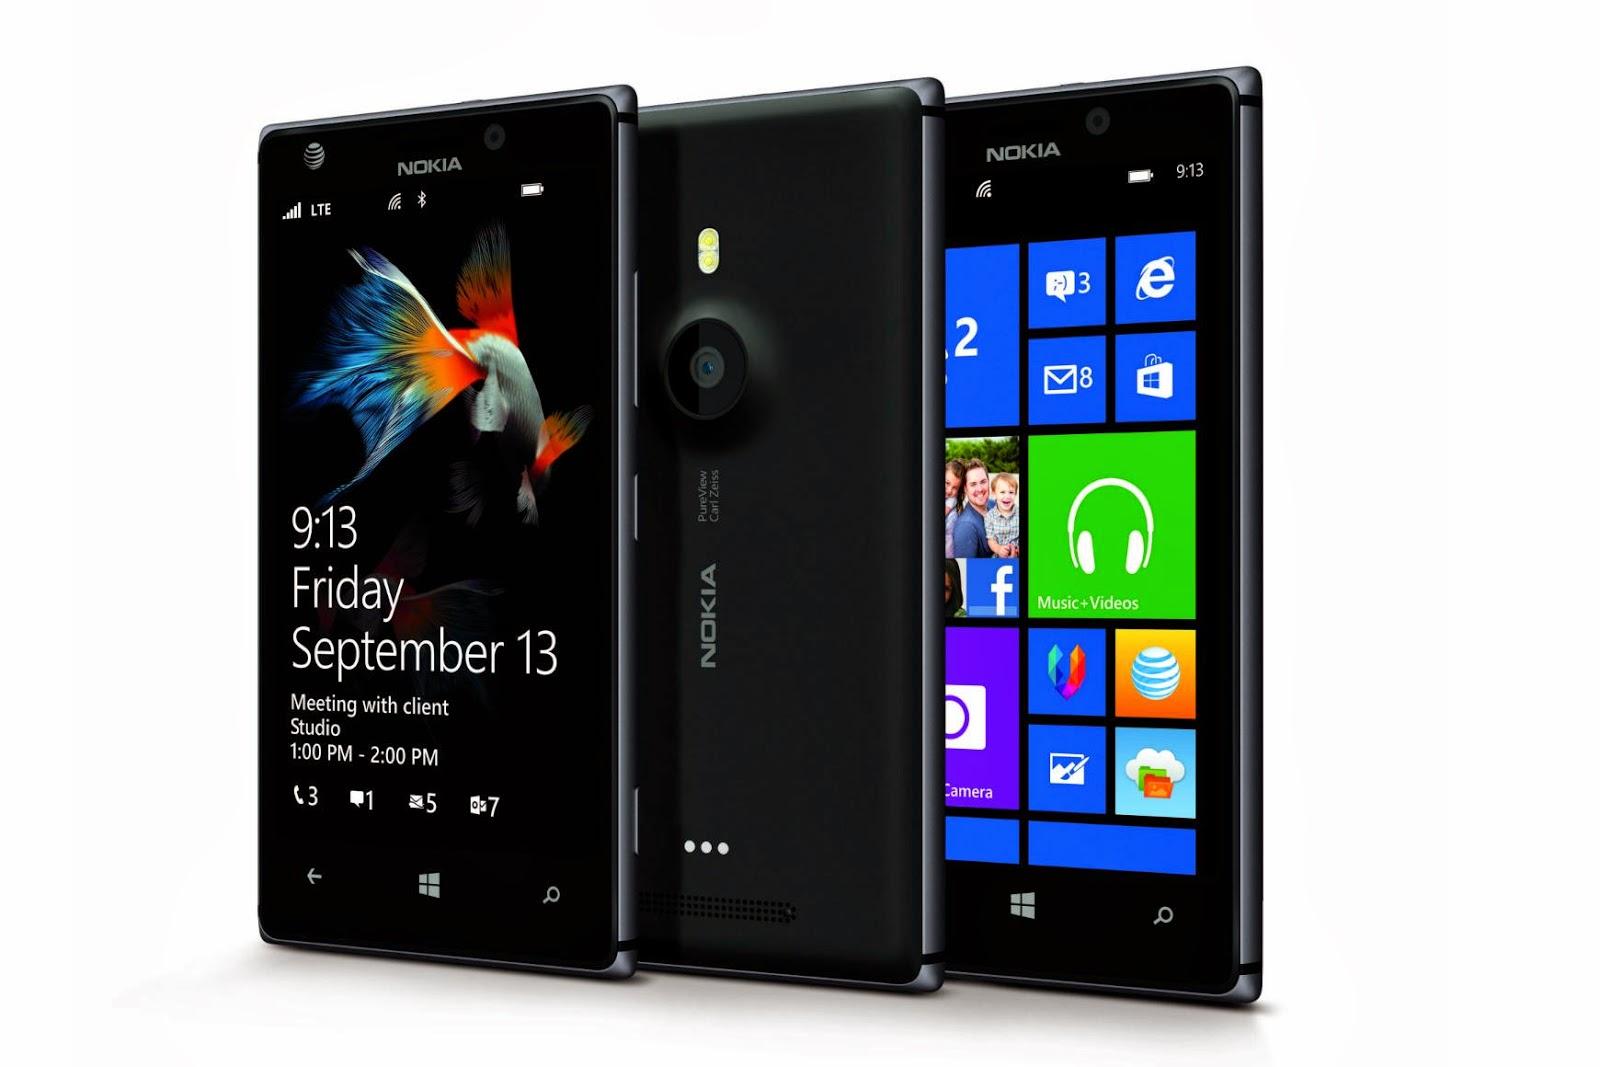 Nokia Lumia 925 Review and Specs